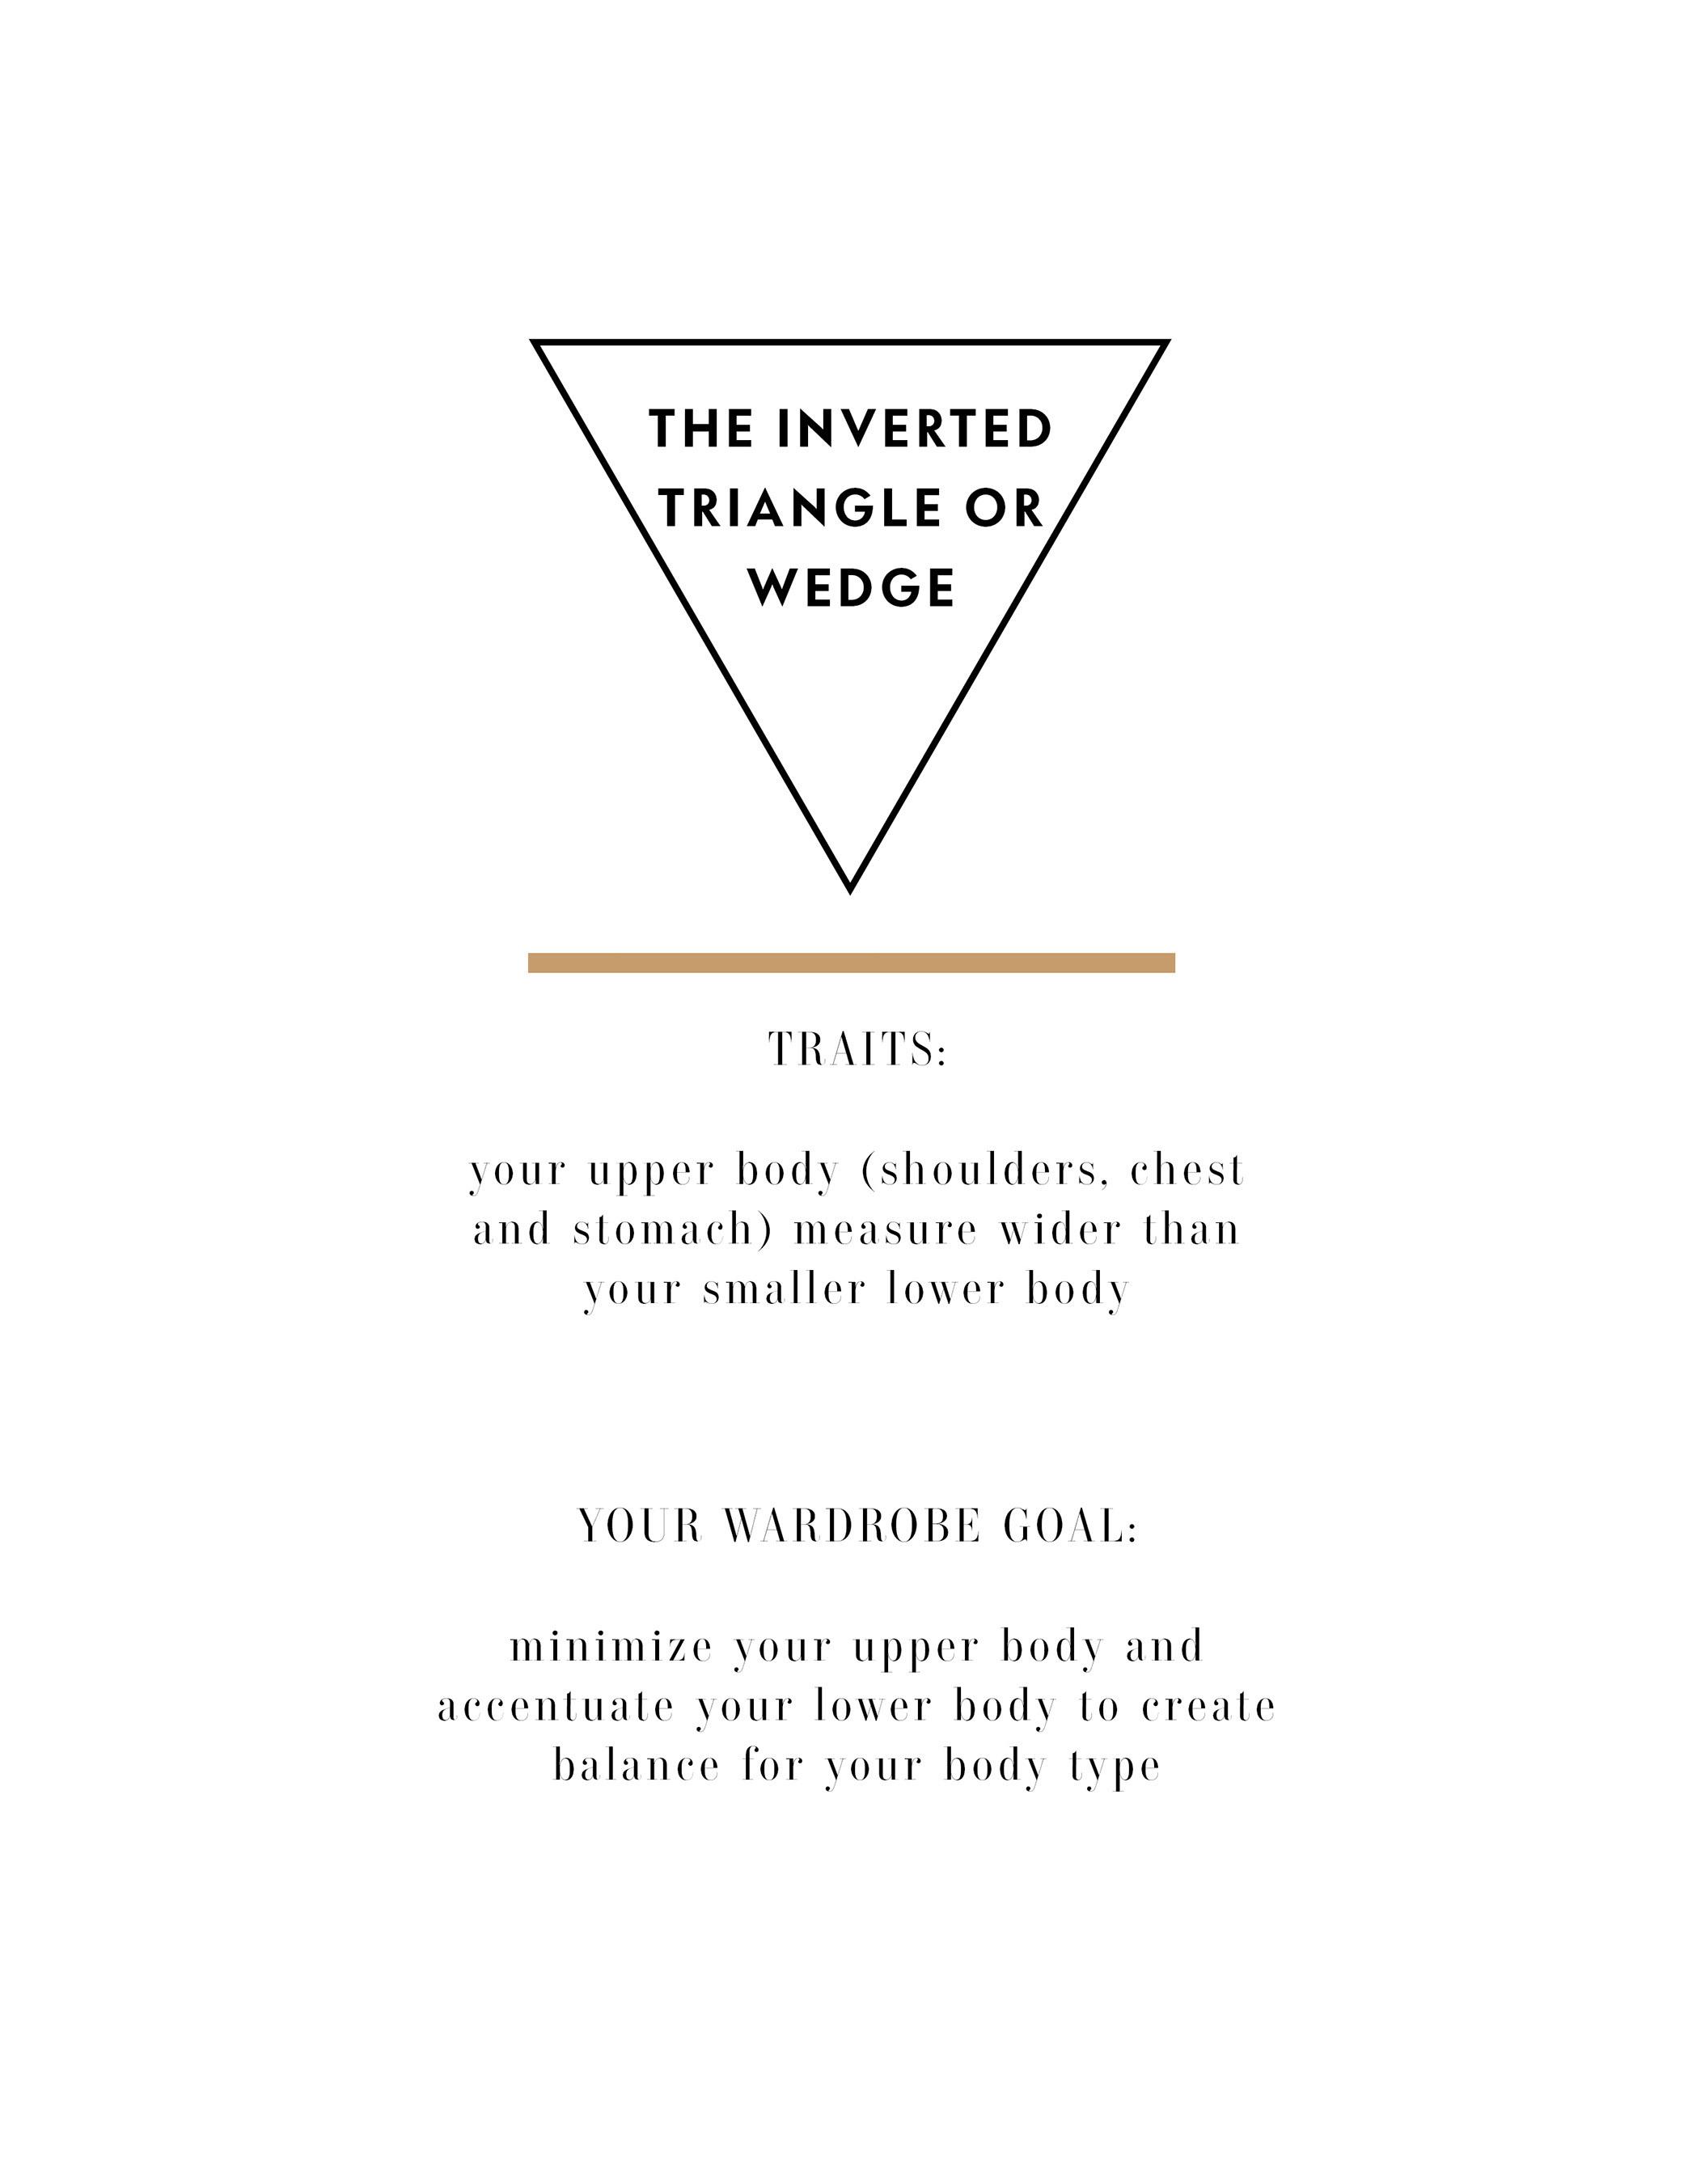 What to Wear Guide - Digital PDF-9-Left.jpg